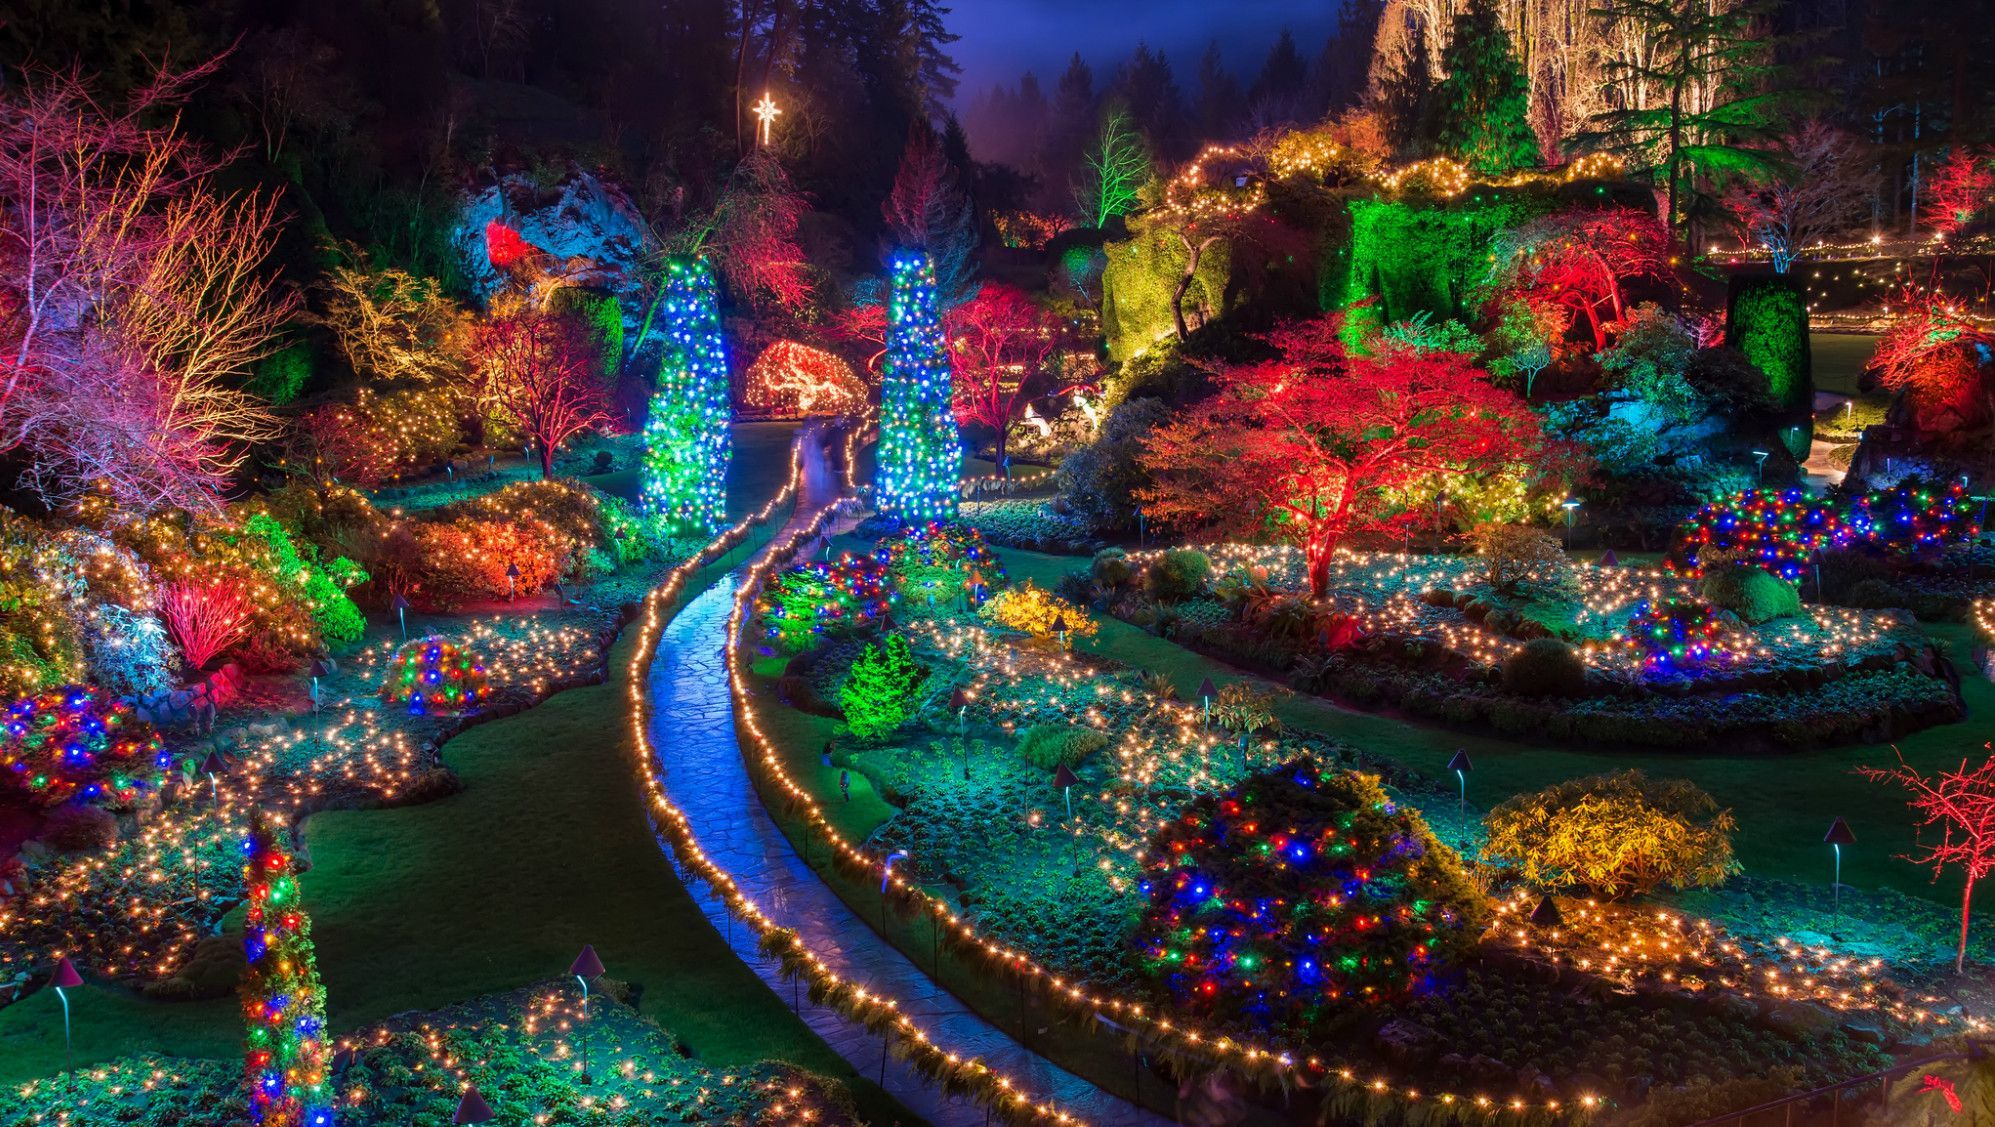 94f0aac366cee7a652430c2198978b85 - The Butchart Gardens Christmas Lights Tour